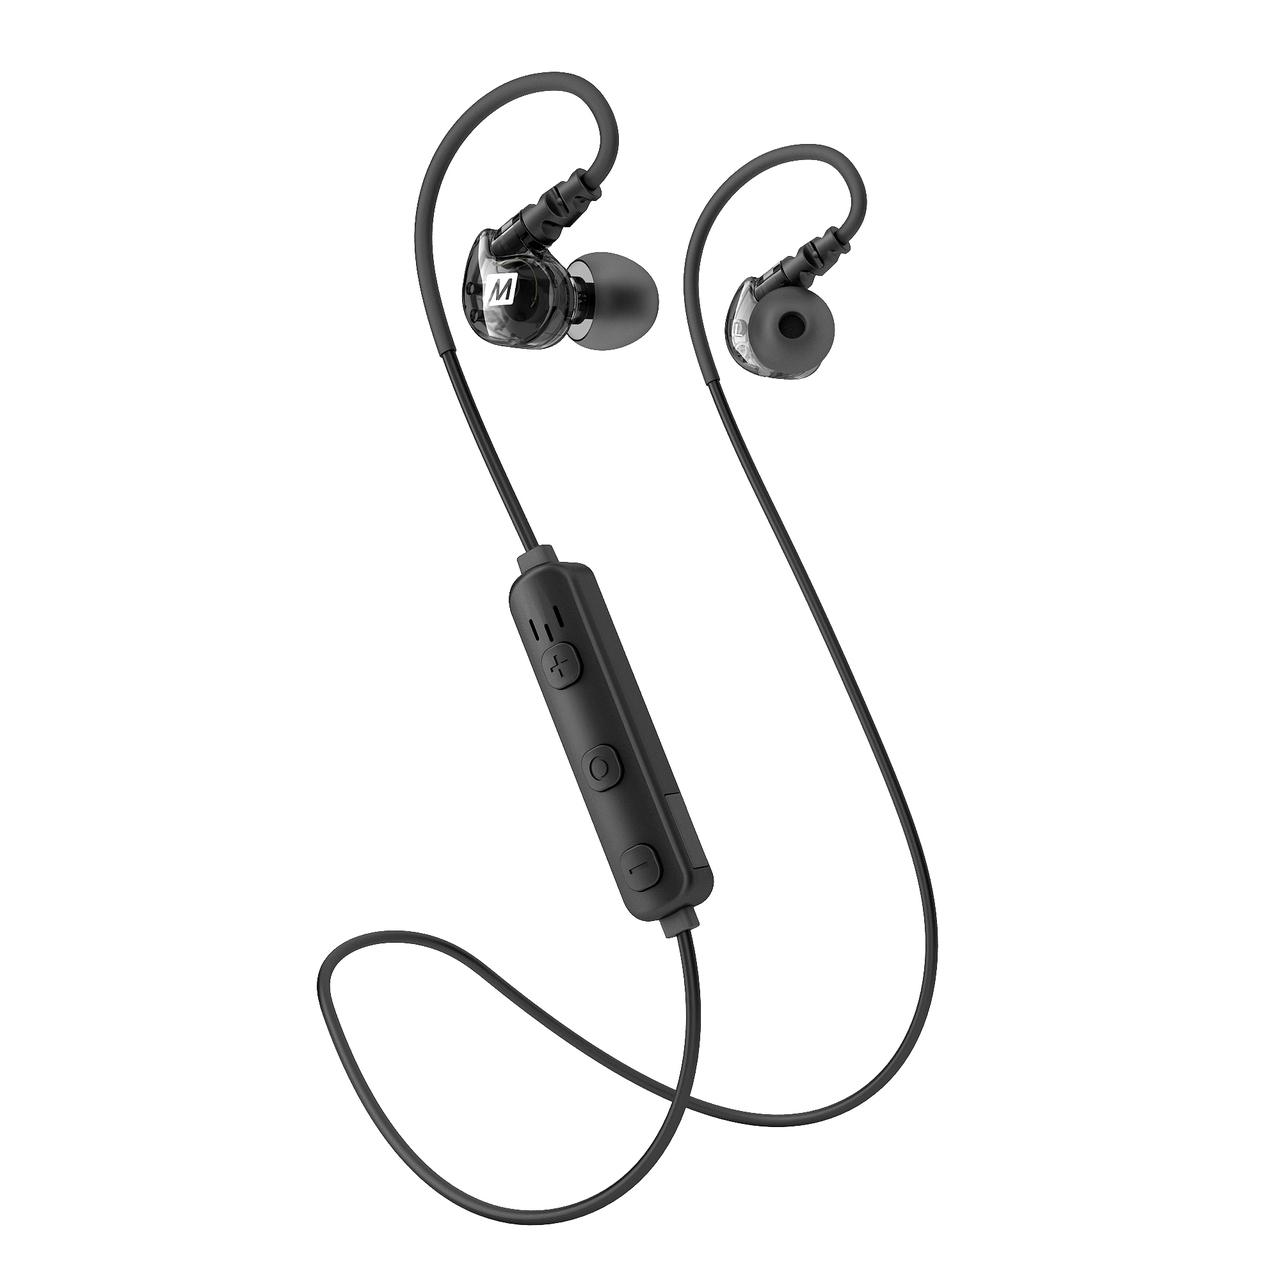 MEEAUDIO X6 PLUS BLUETOOTH WIRELESS IN-EAR HEADPHONES - EP-X6PLUS-BK-MEE